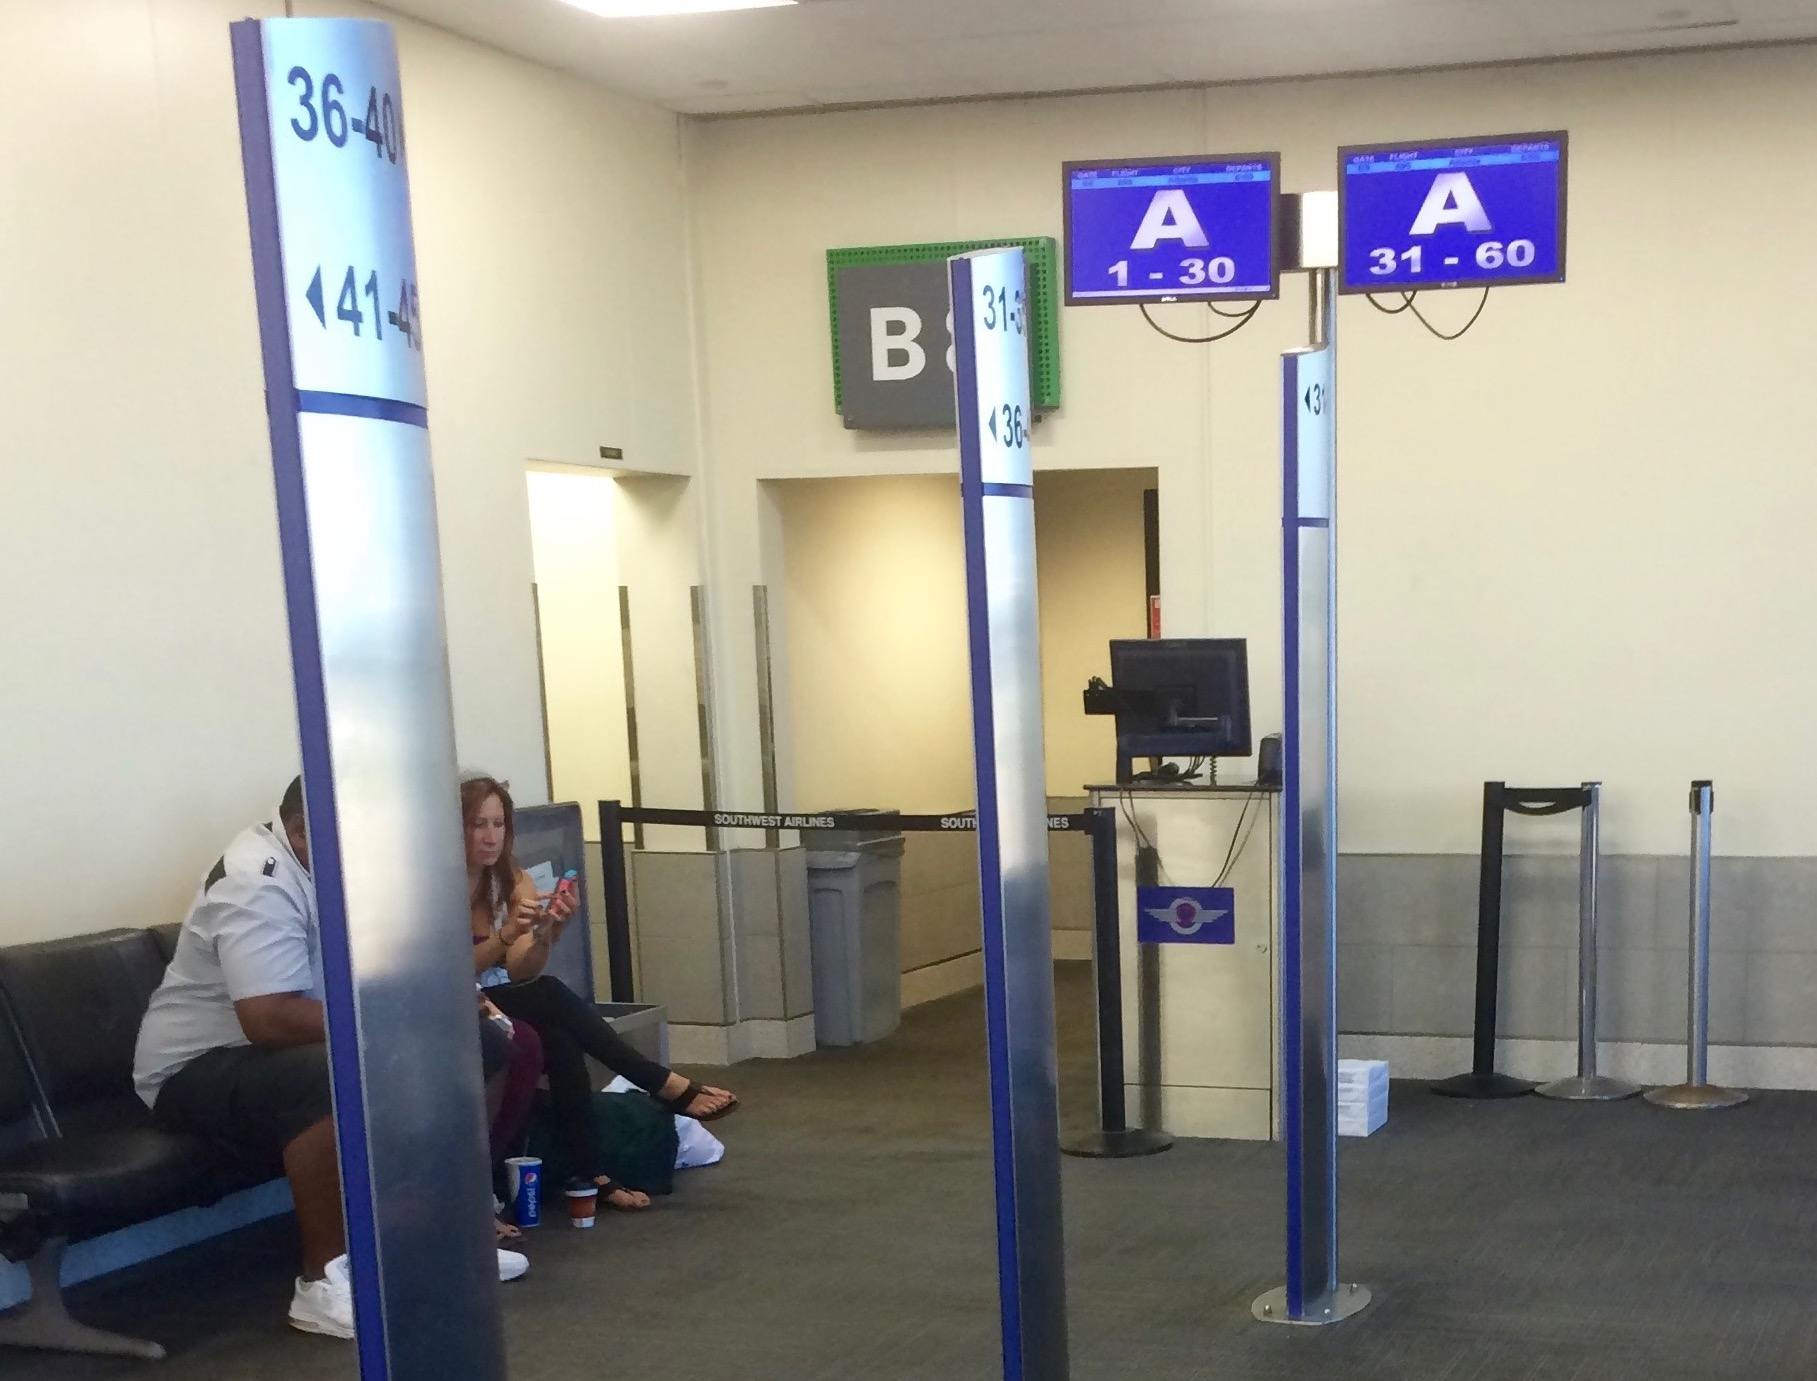 Southwest airline boarding